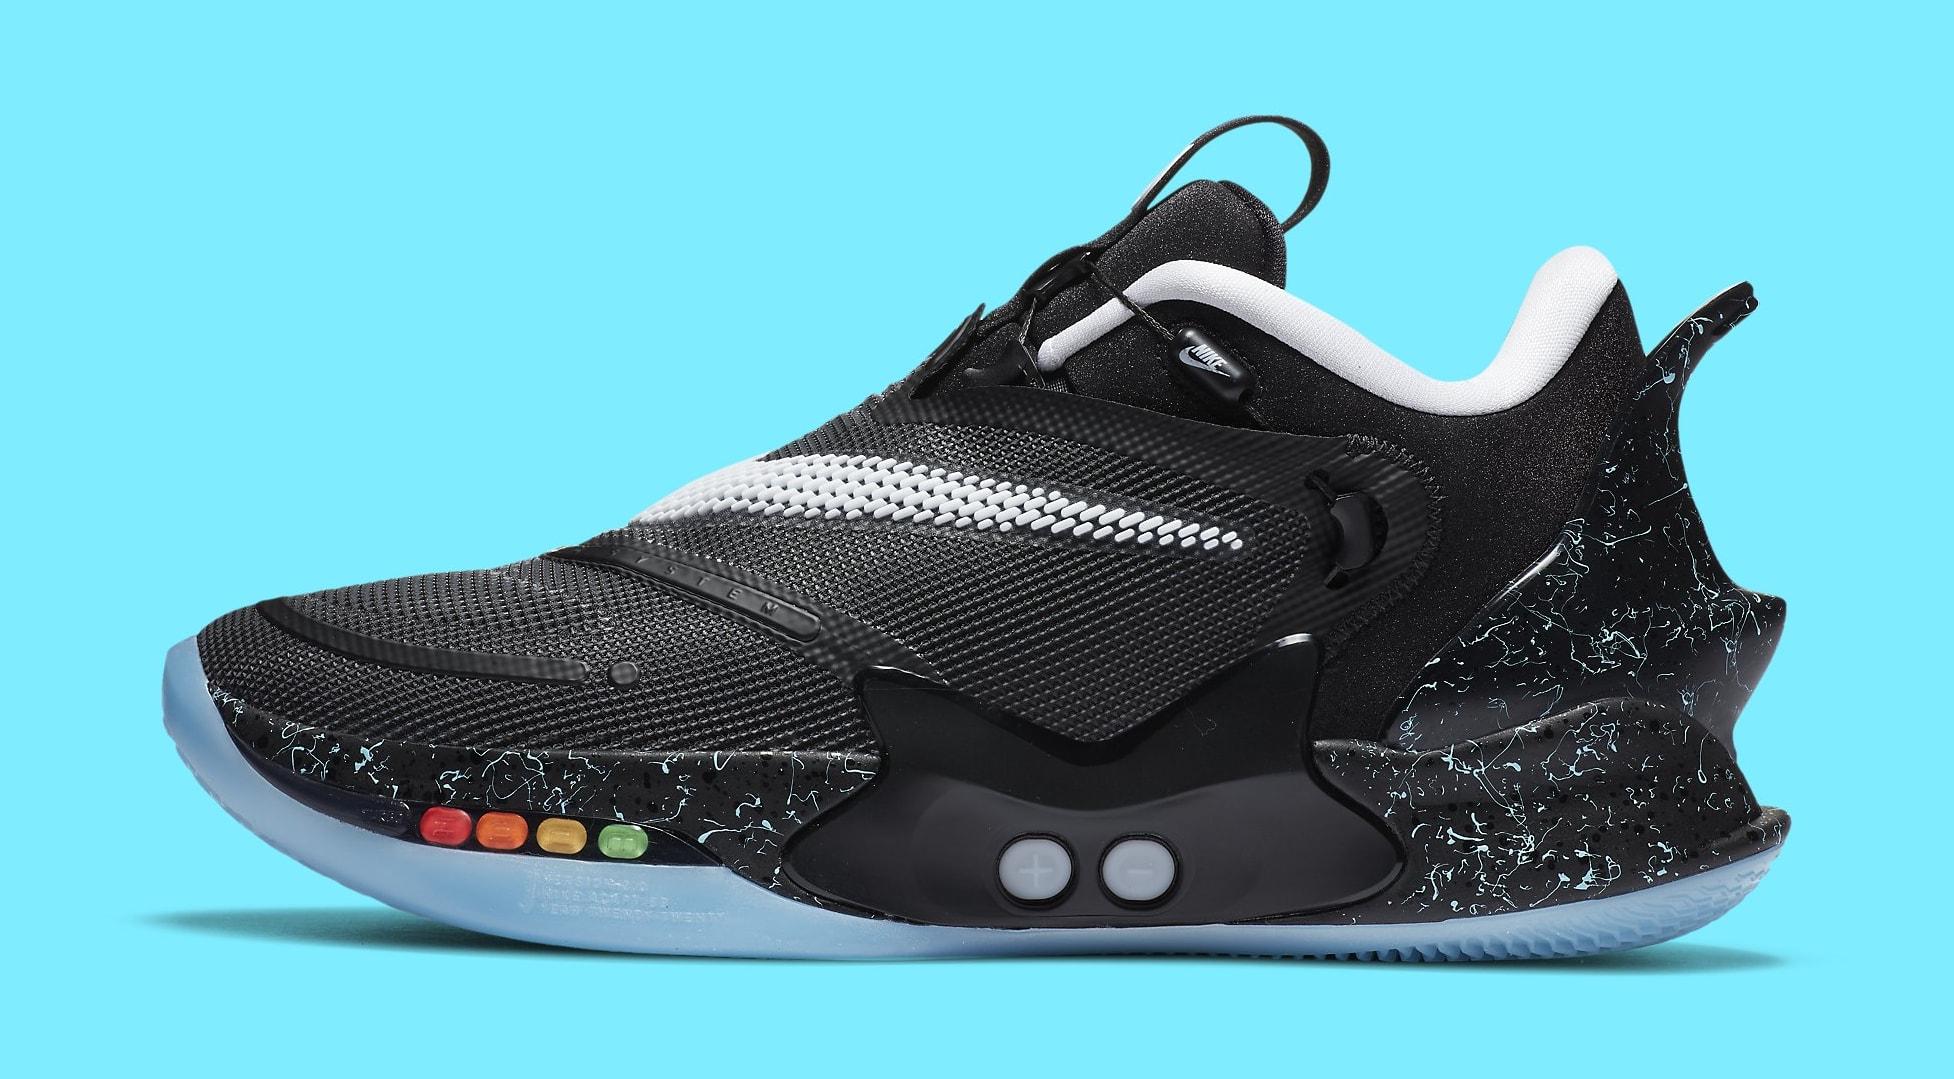 Nike Adapt BB 2.0 'Alternate Mag' CV2441-002 Lateral